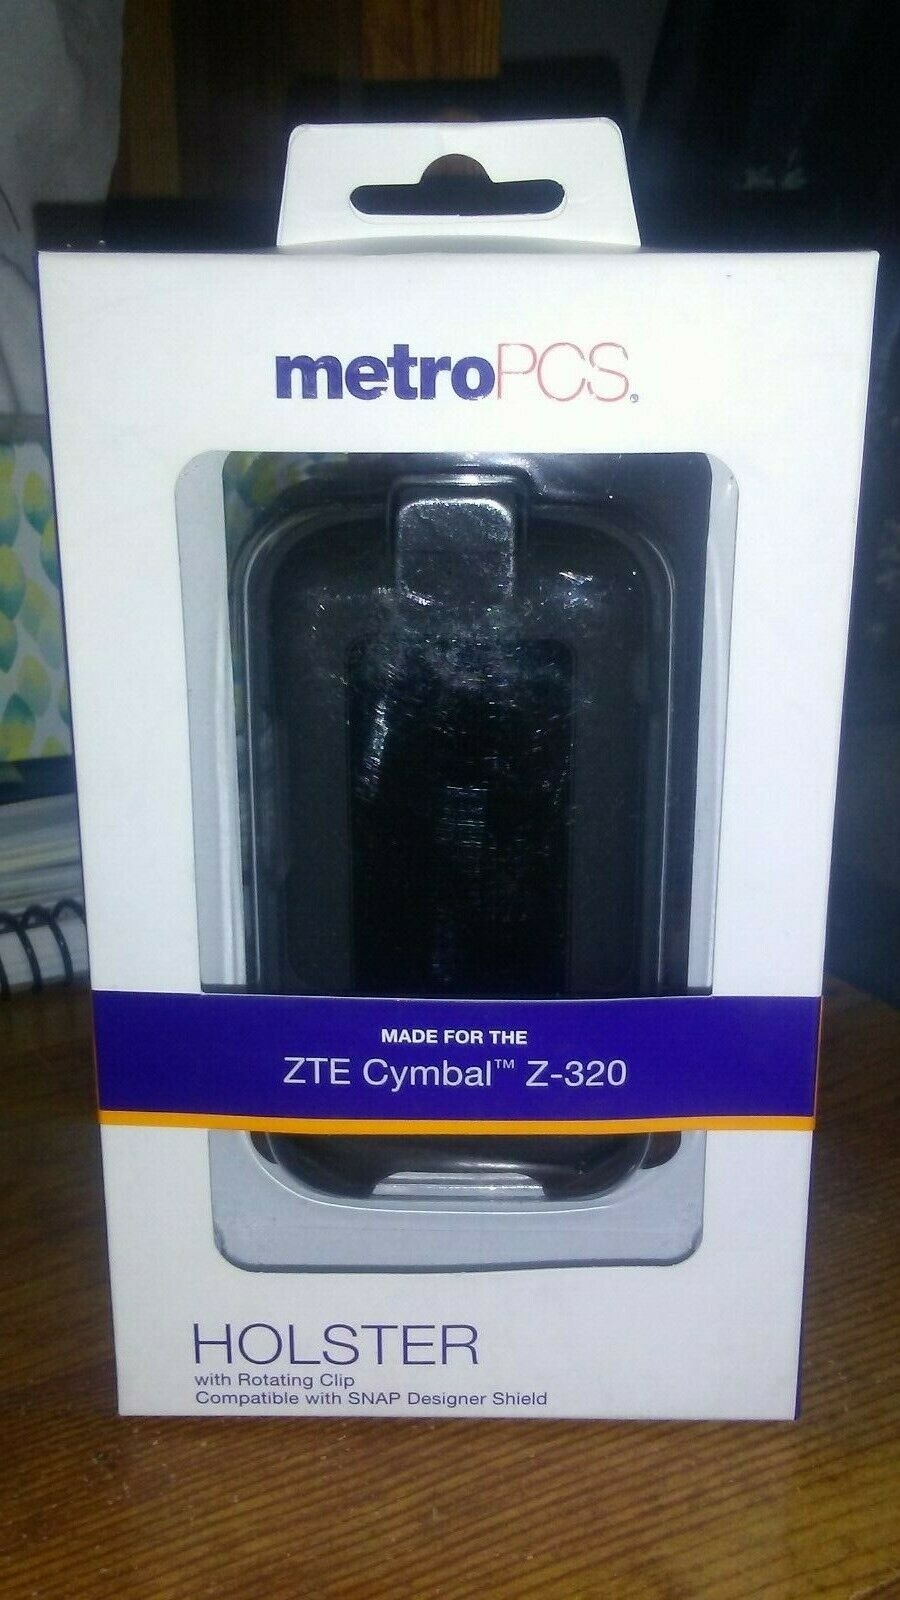 Metro PCS ZTE Cymbal Z-320 holster, flip phone, ROTATING CLI